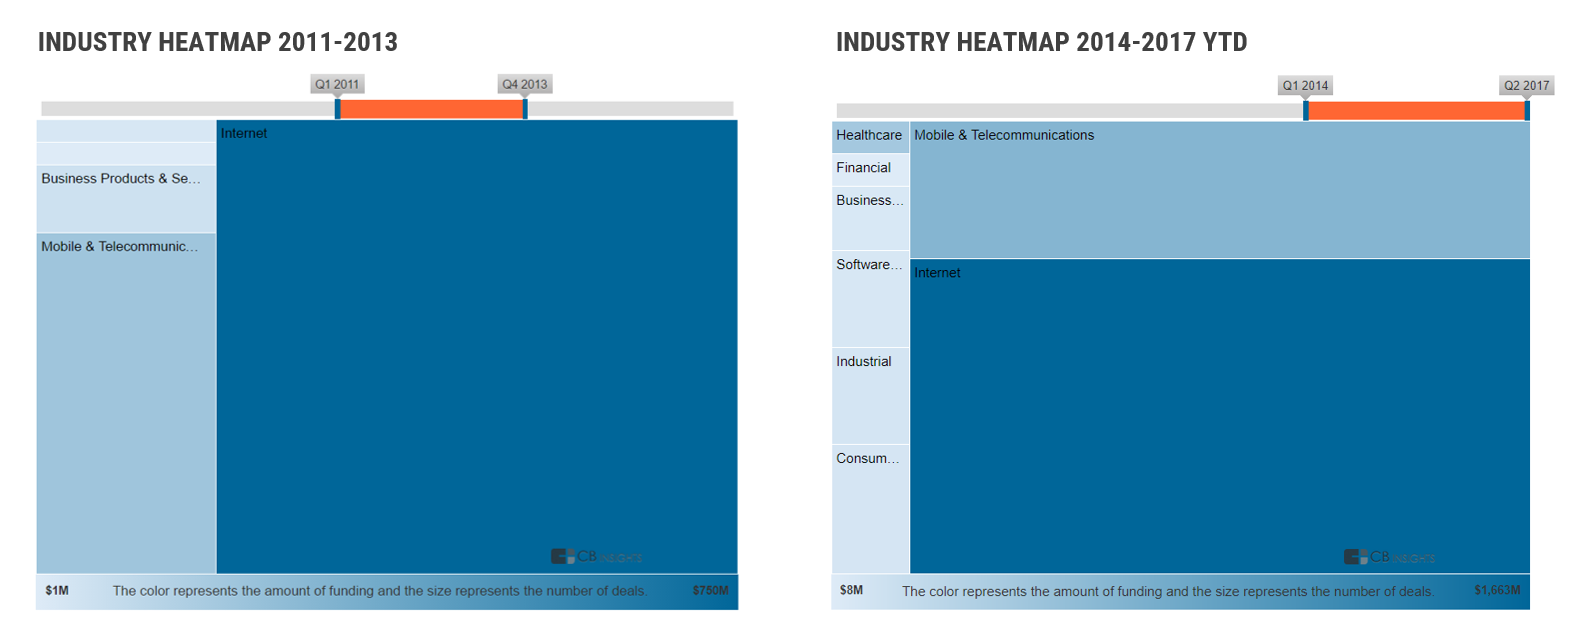 Social Capital Industry Heatmap